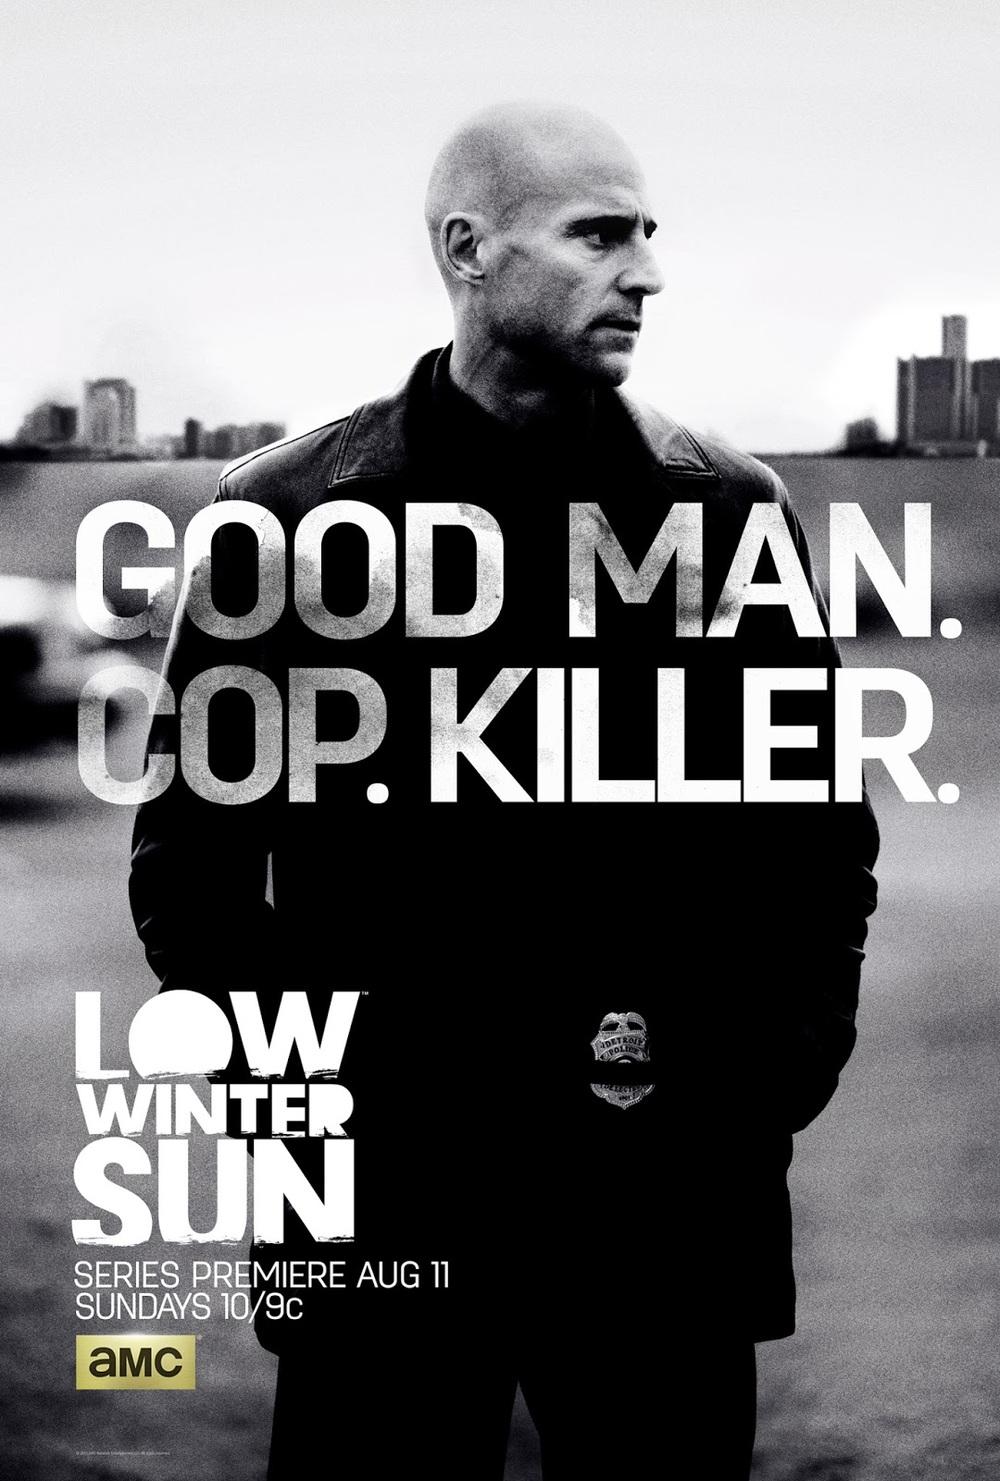 low-winter-sun-poster1.jpg